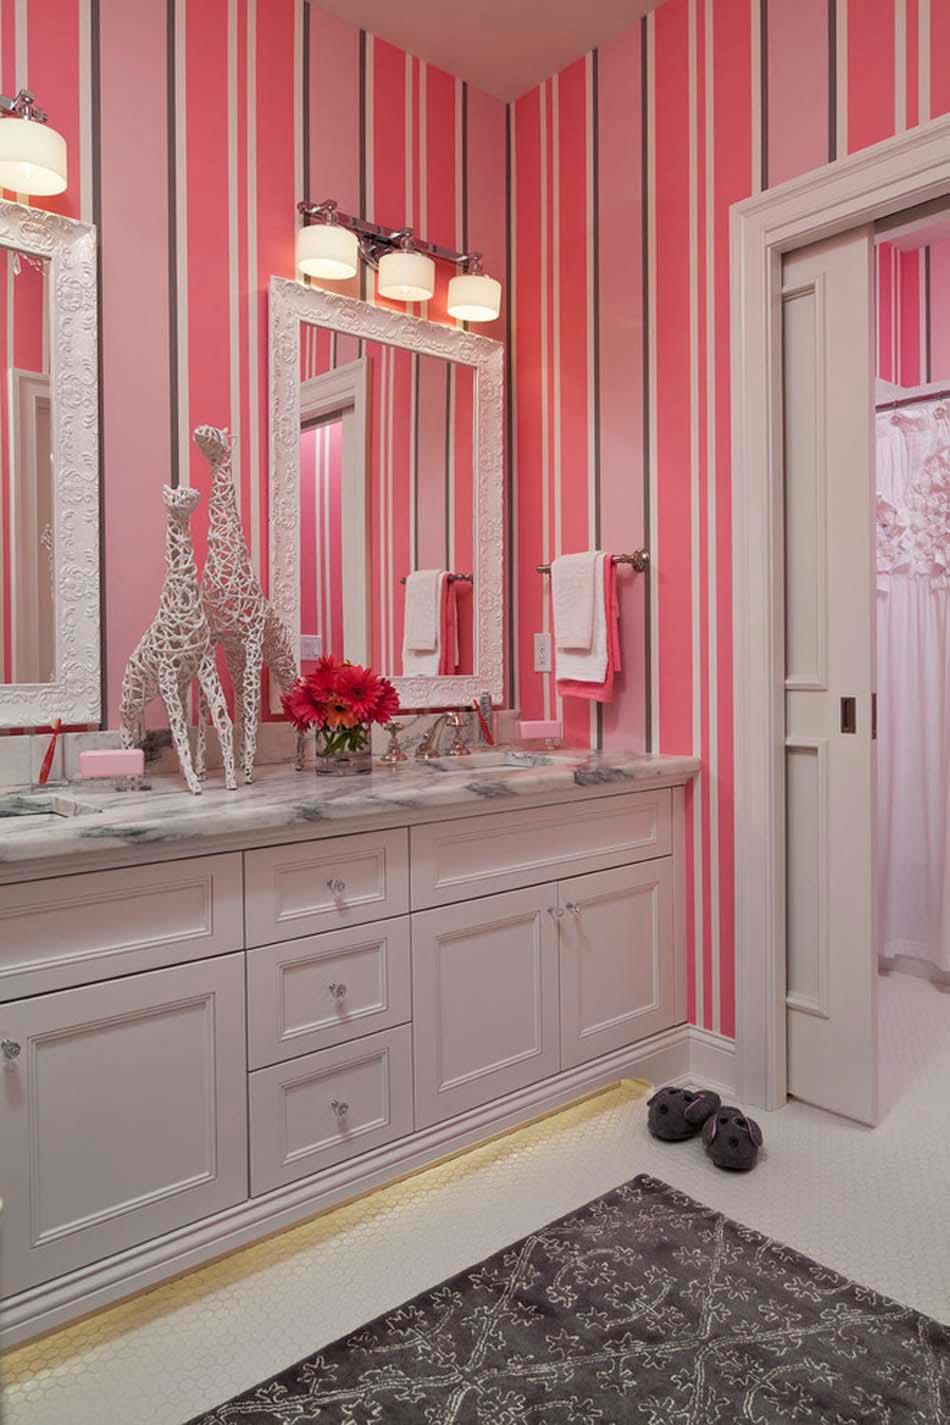 Обои в туалете в розовую полоску